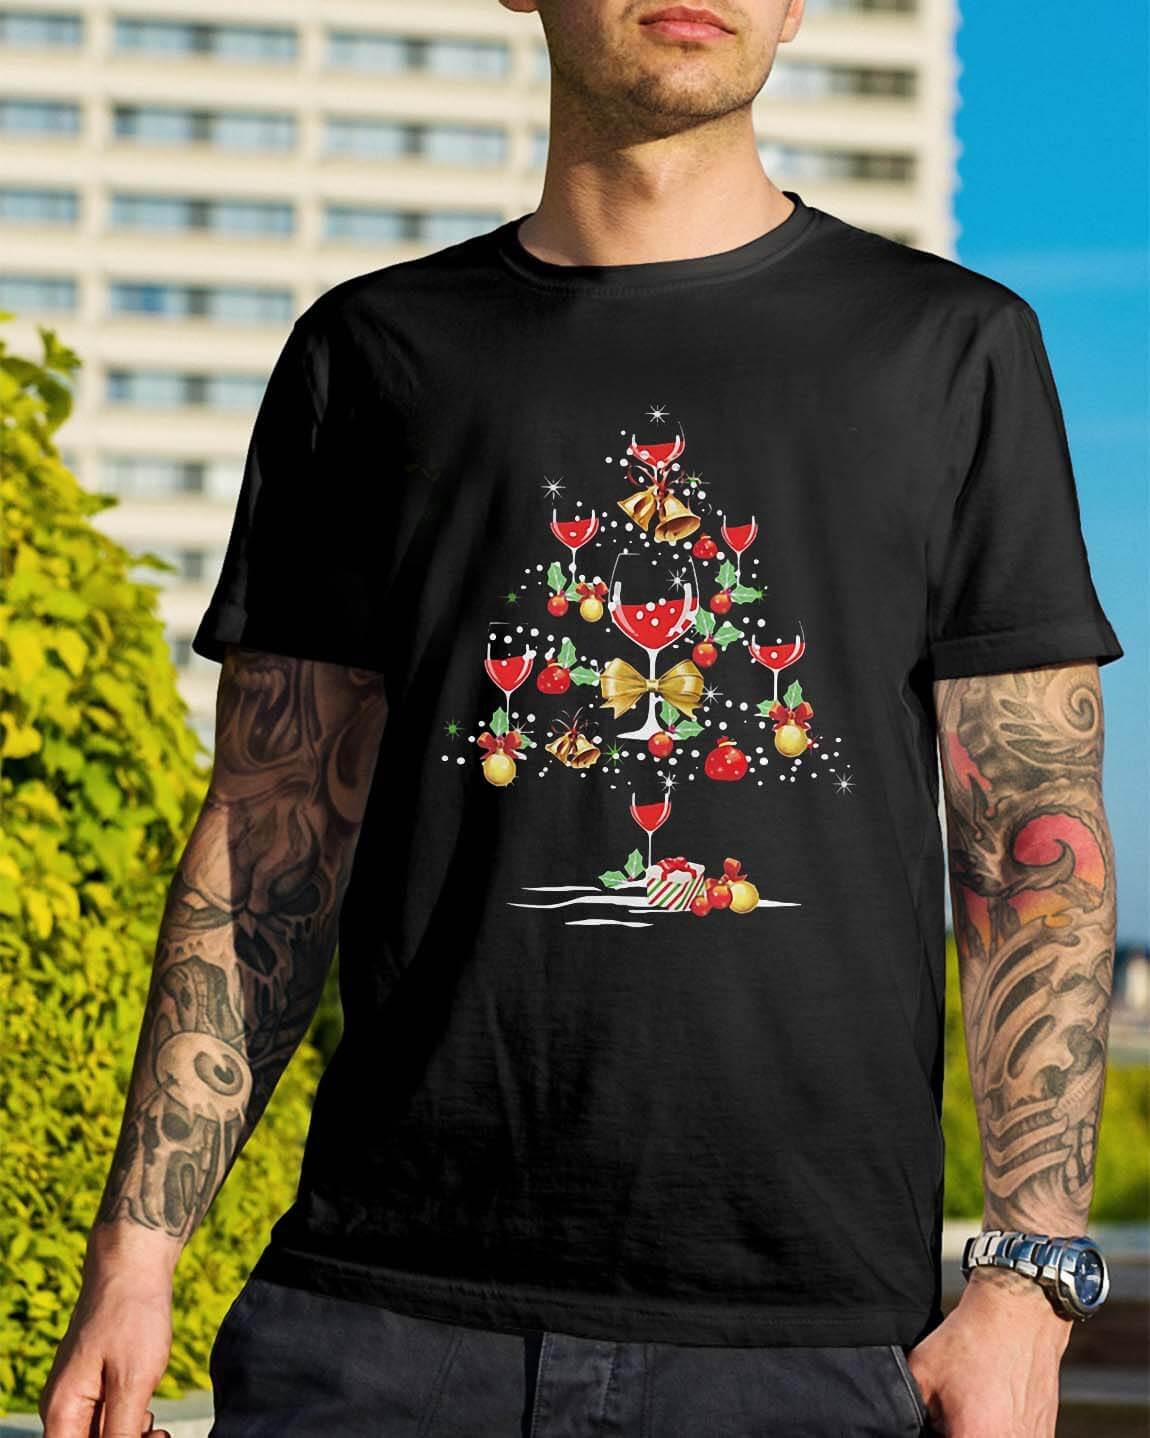 Wine Christmas Tree Shirt.Wine Glass Christmas Tree Shirt Hoodie Sweater And V Neck